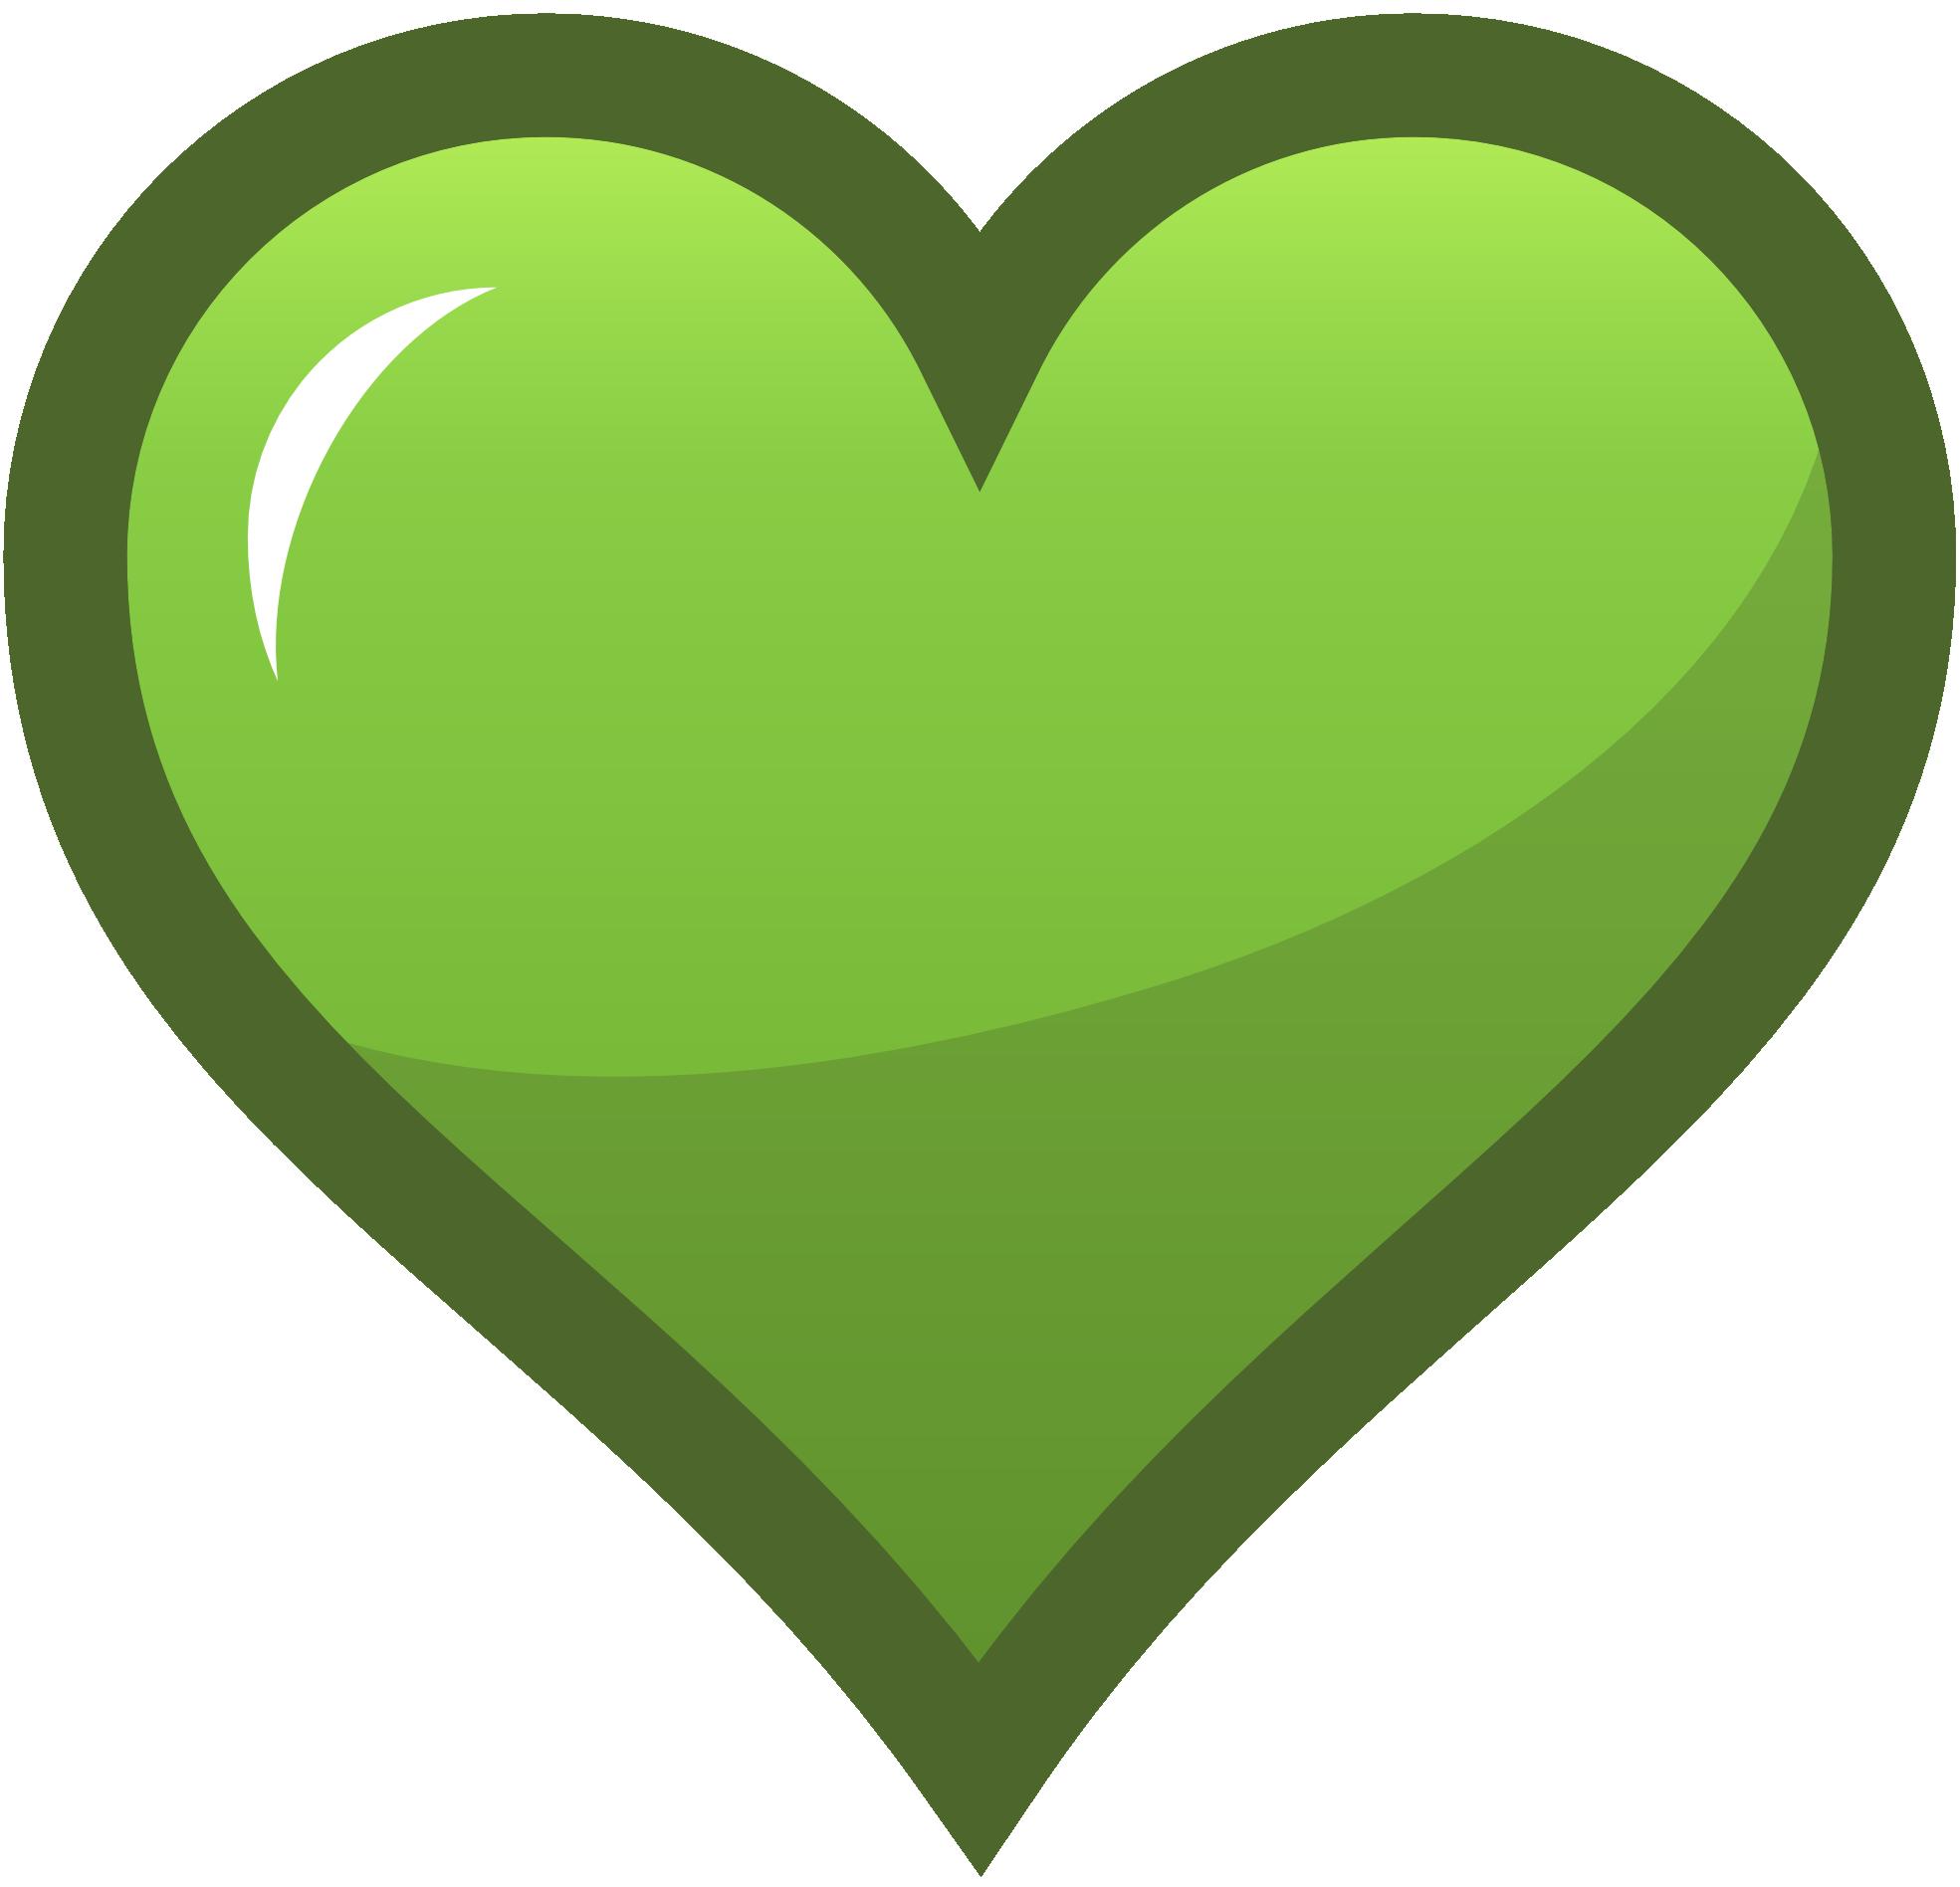 Yellowgreen green icon ocal. Heat clipart row heart